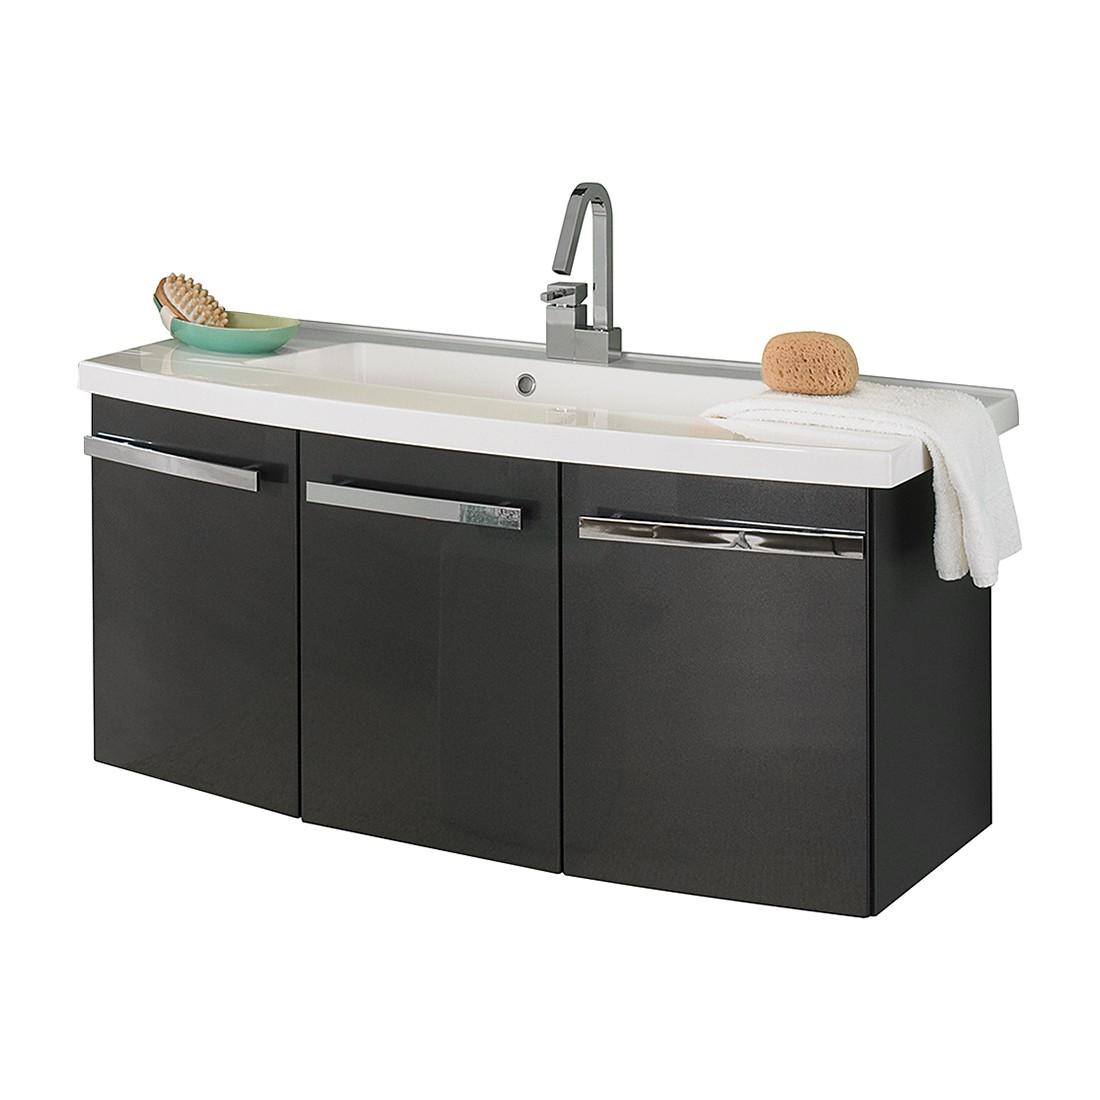 Lavabo Bina - Antracite, 110 cm, Aqua Suite